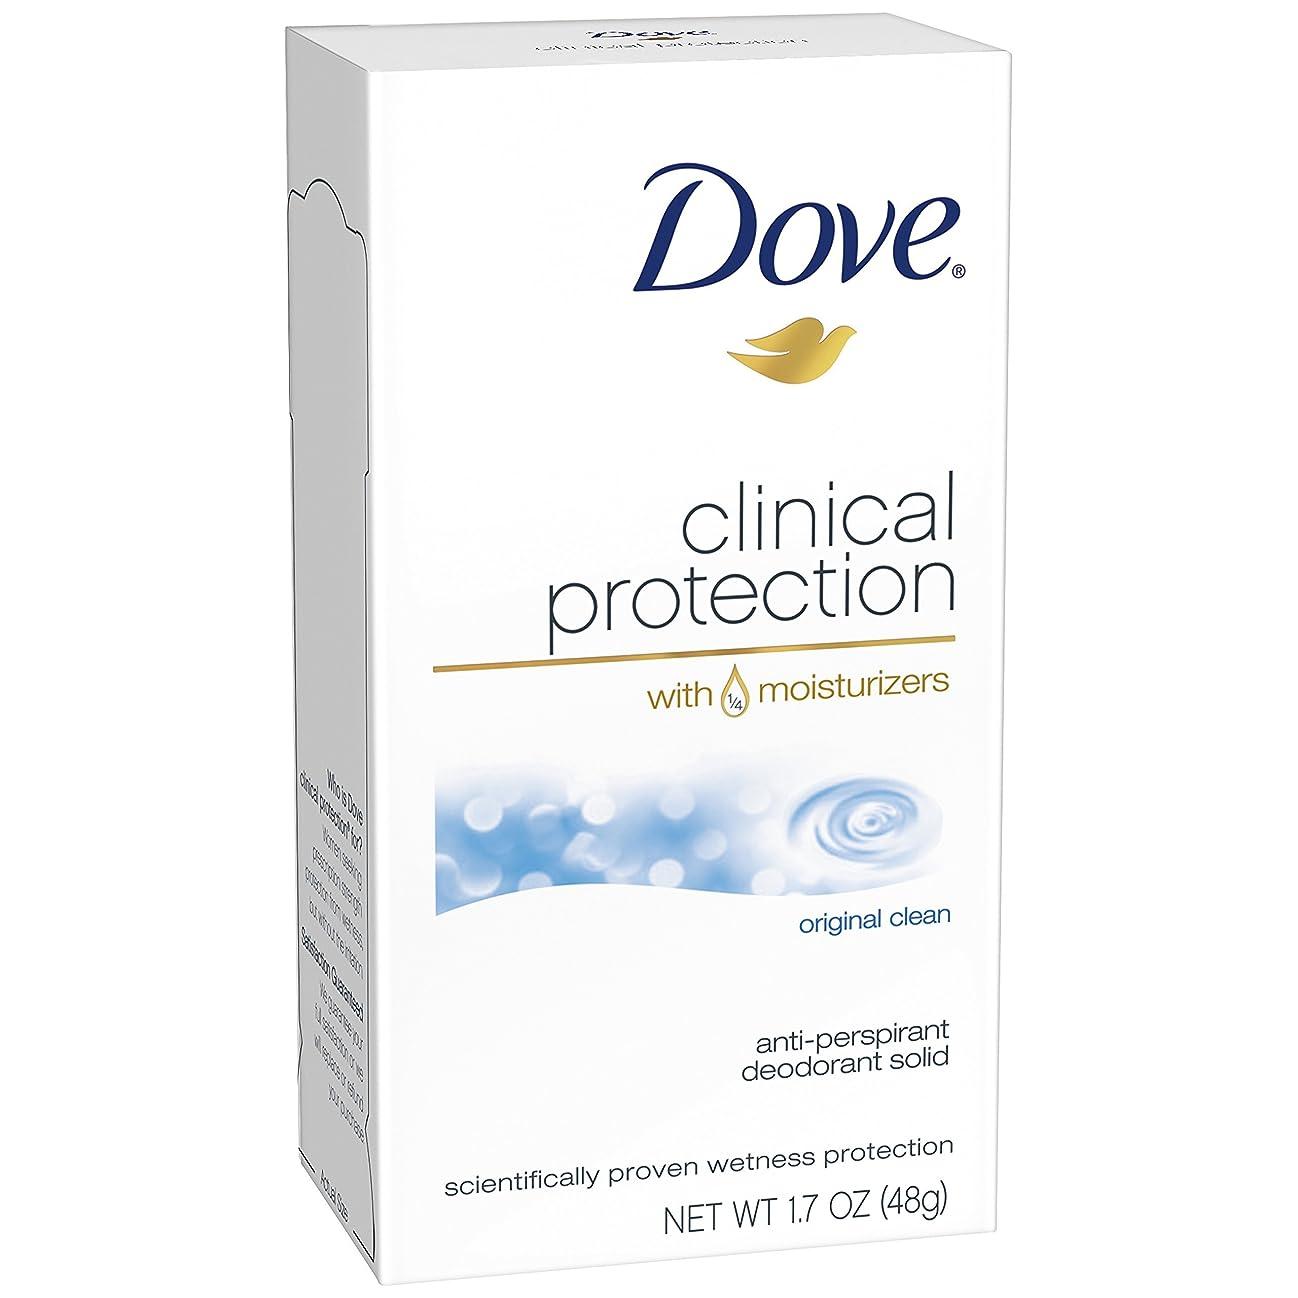 Dove Clinical Protection Antiperspirant Deodorant, Original Clean 1.7 oz yadeo918914